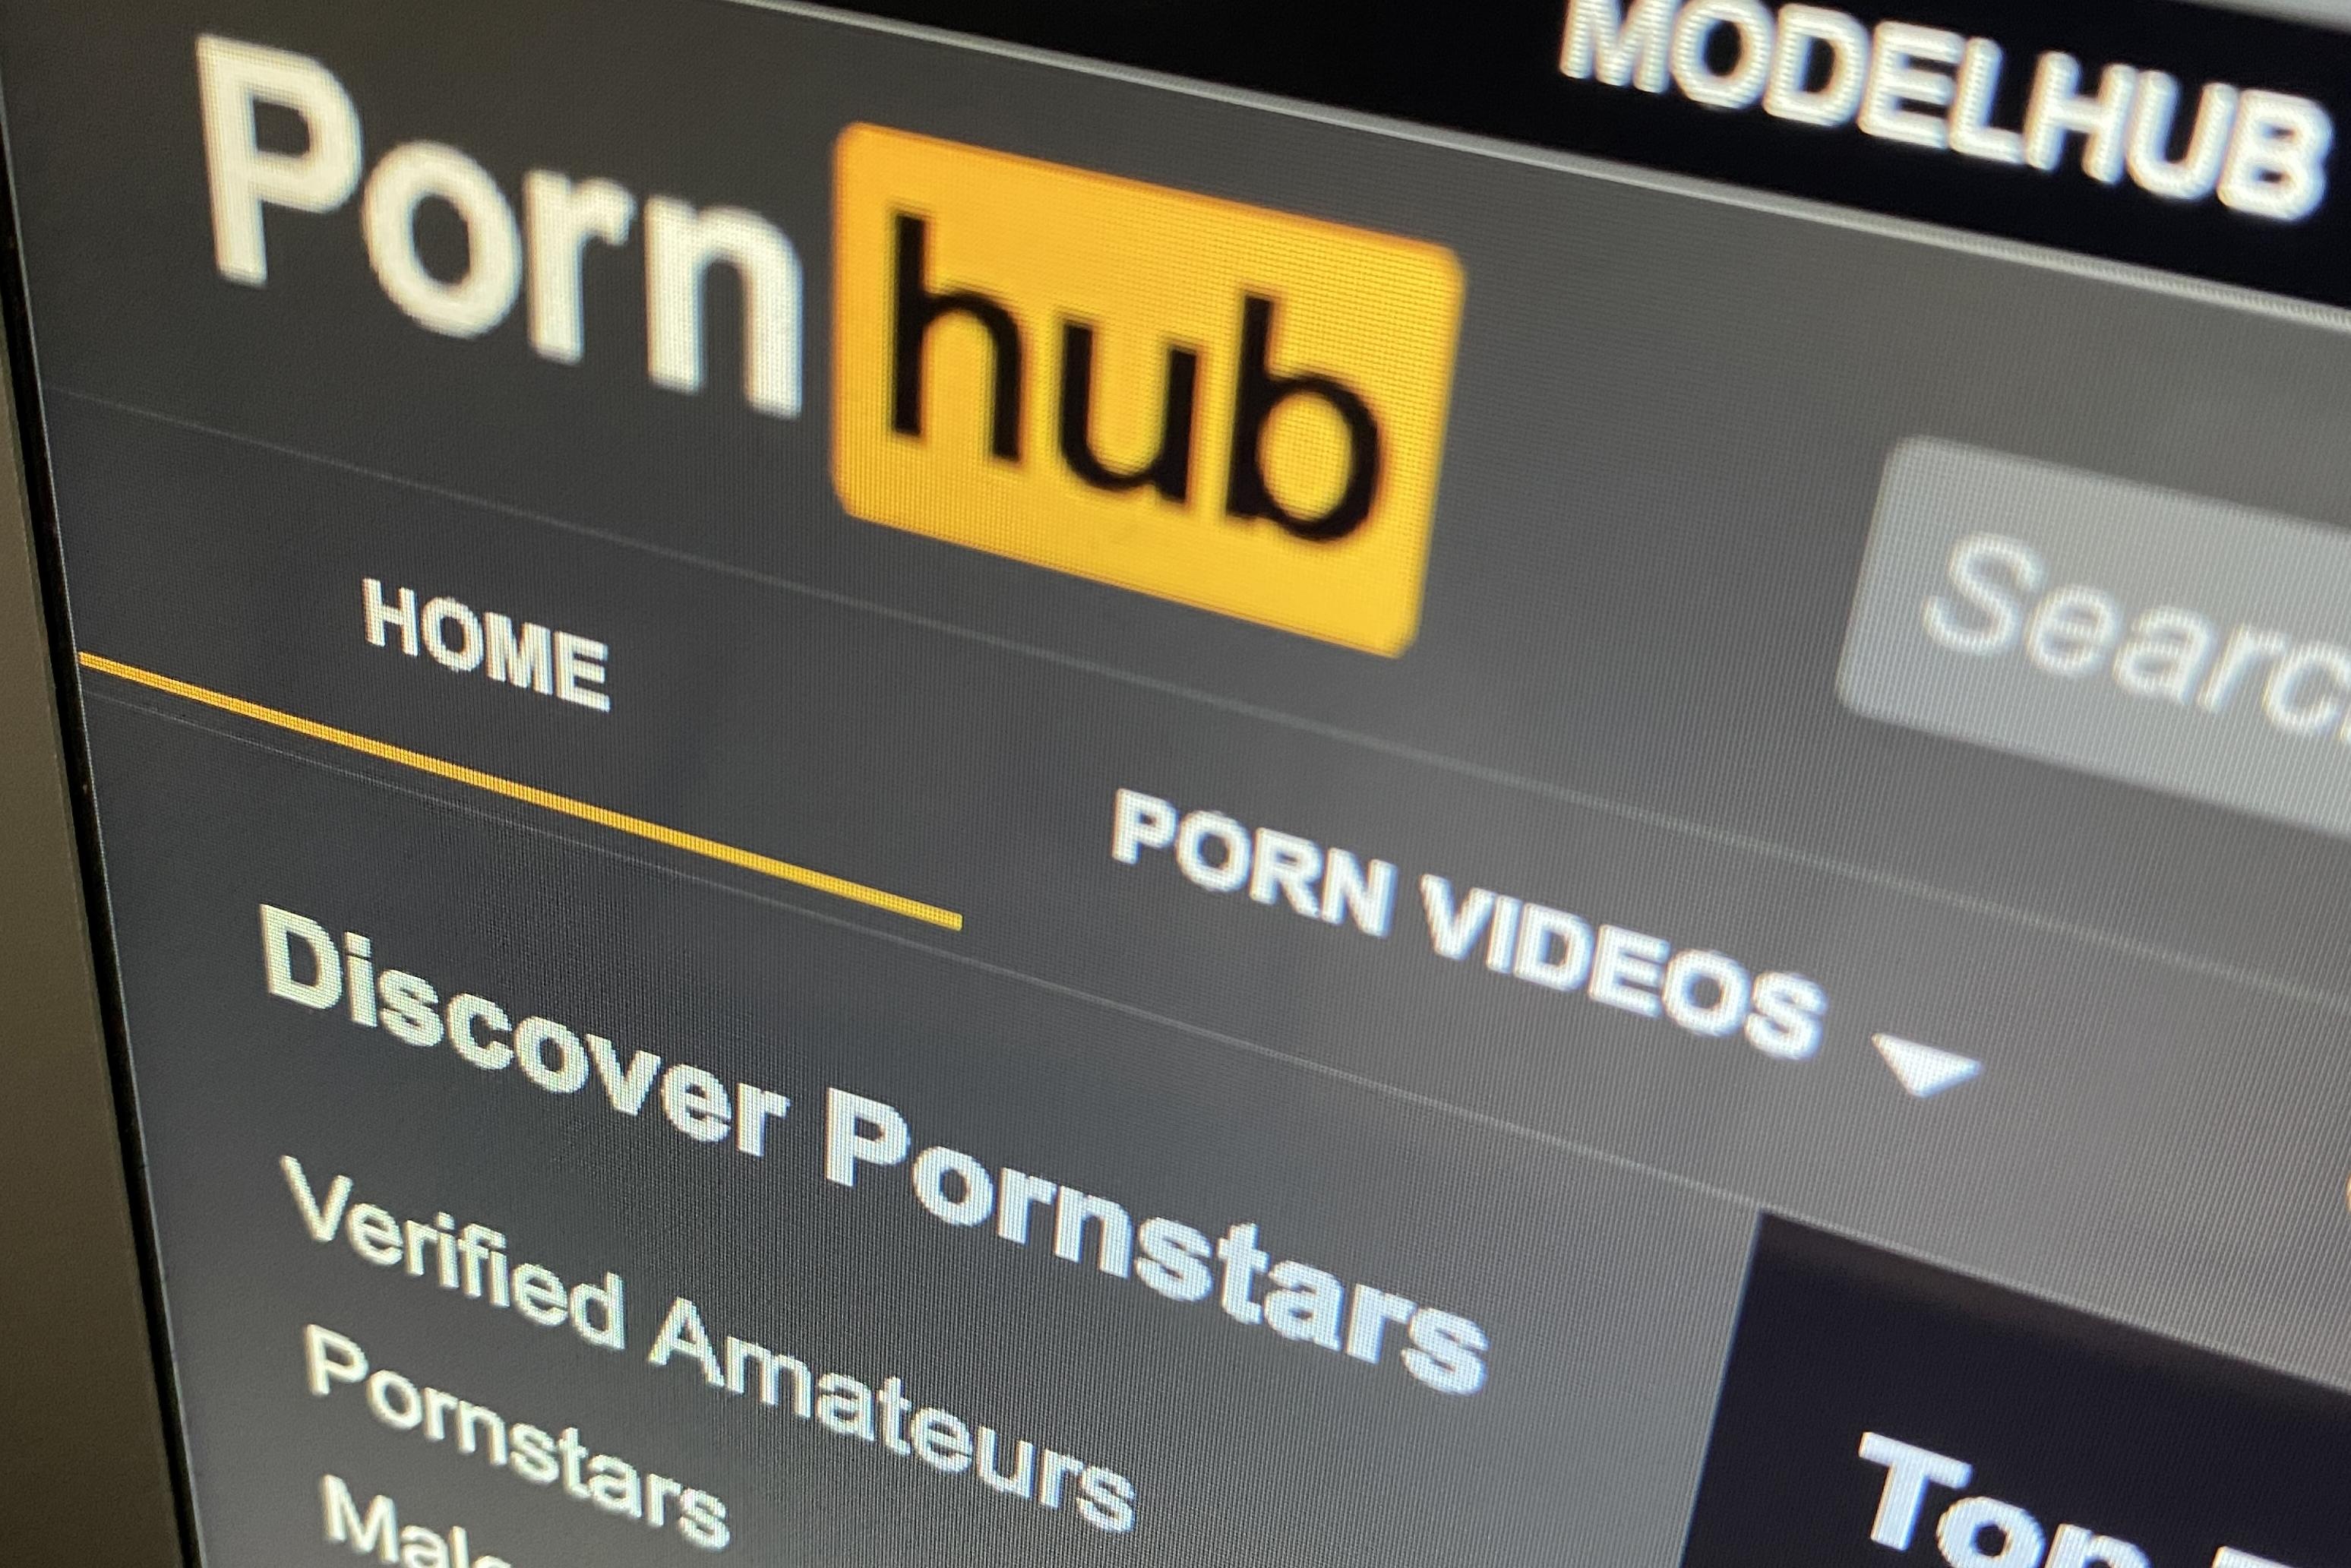 Pornhub Link